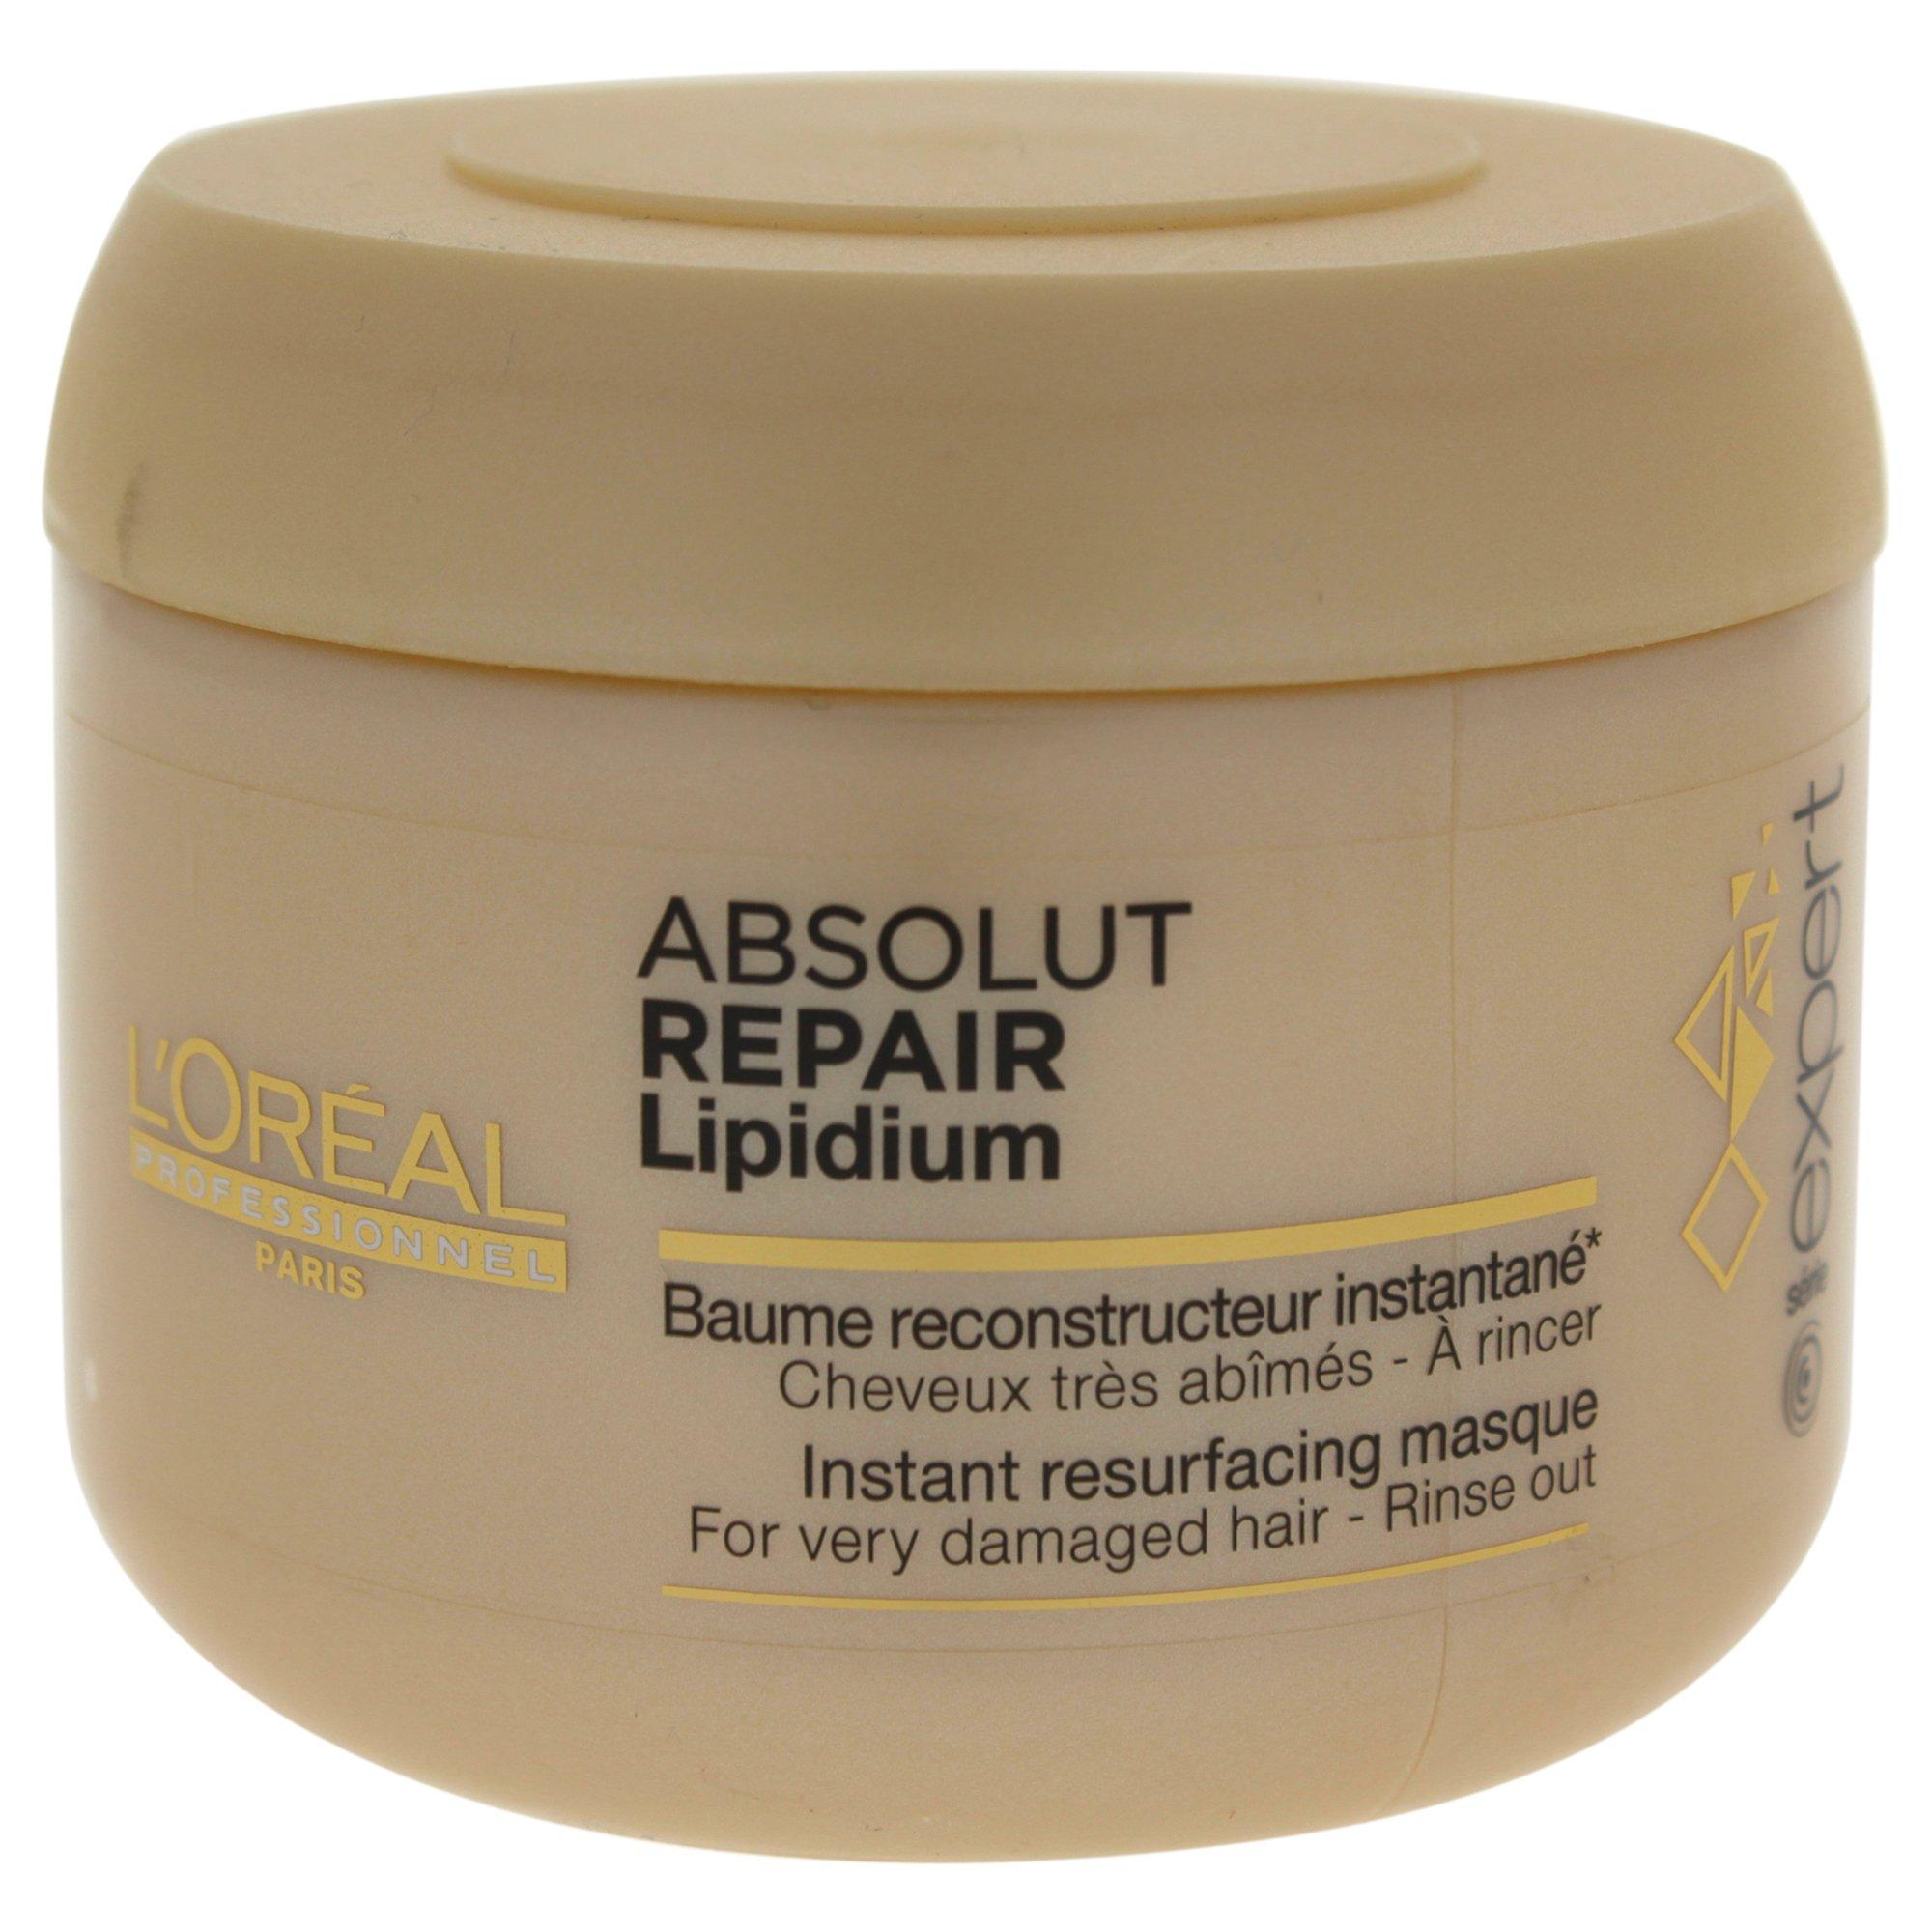 L'oreal Professional Expert Serie Absolut Repair Cellular Masque, 6.76 oz